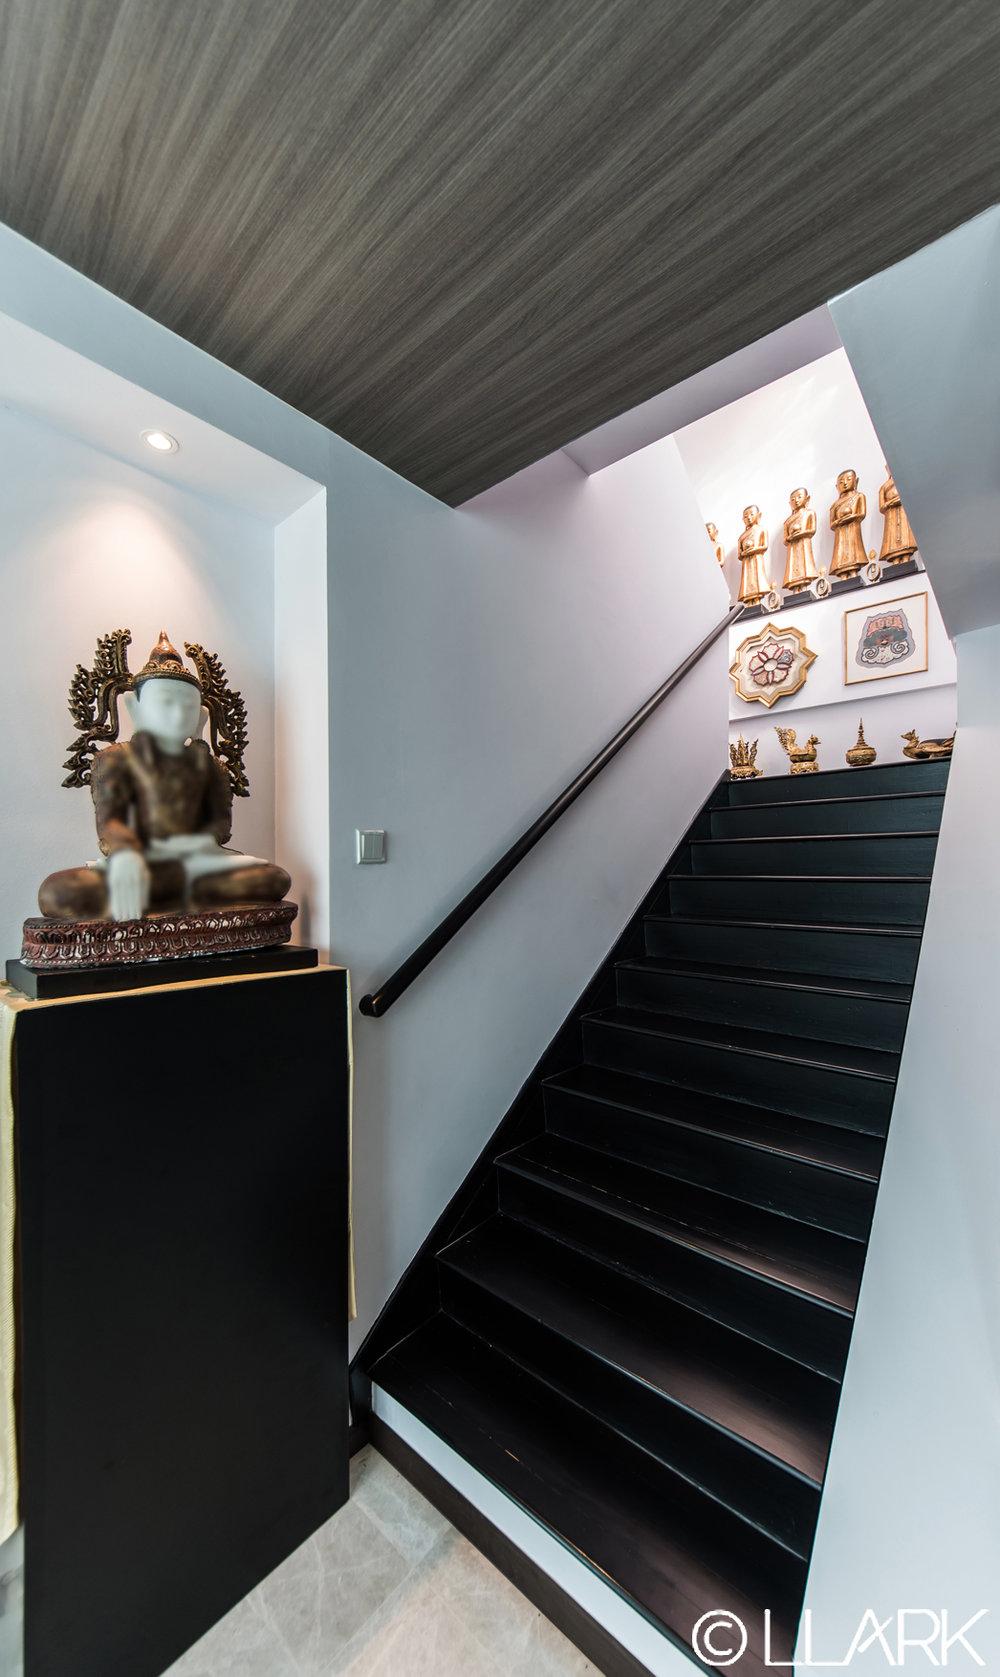 CV_Stairs.jpg